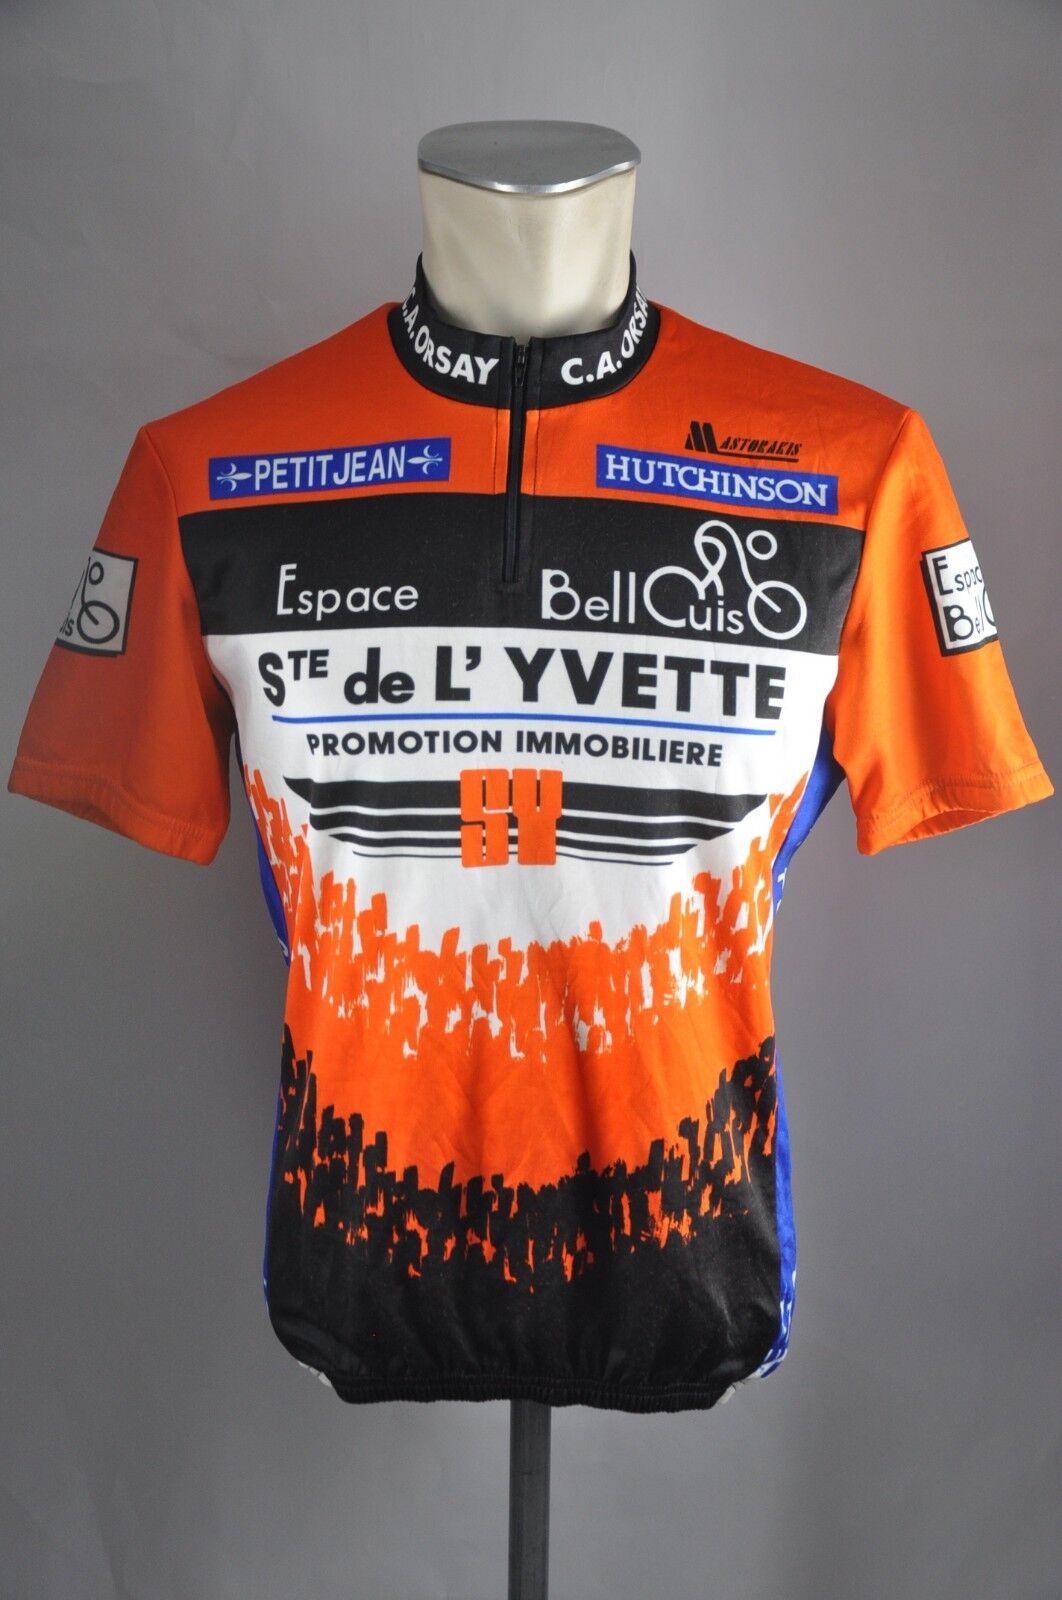 C.A. Orsay Bell Cuis vintage jersey bike Gr. 5 BW 53cm cycling Rad Trikot KE2